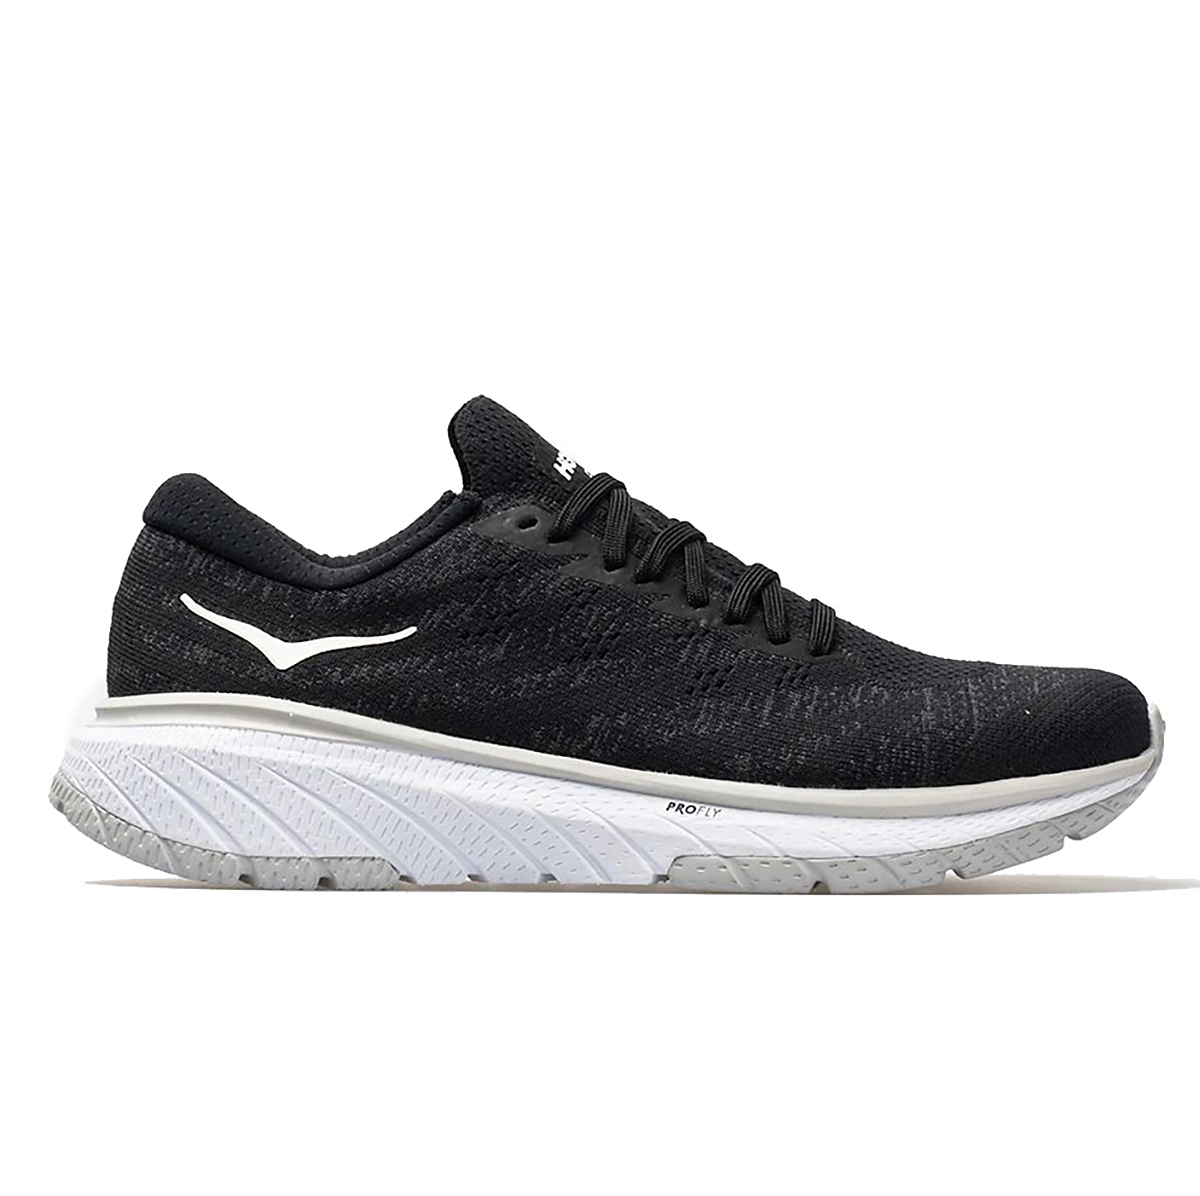 Men's Hoka One One Cavu 3 Running Shoe - Color: Black/White - Size: 7 - Width: Regular, Black/White, large, image 1